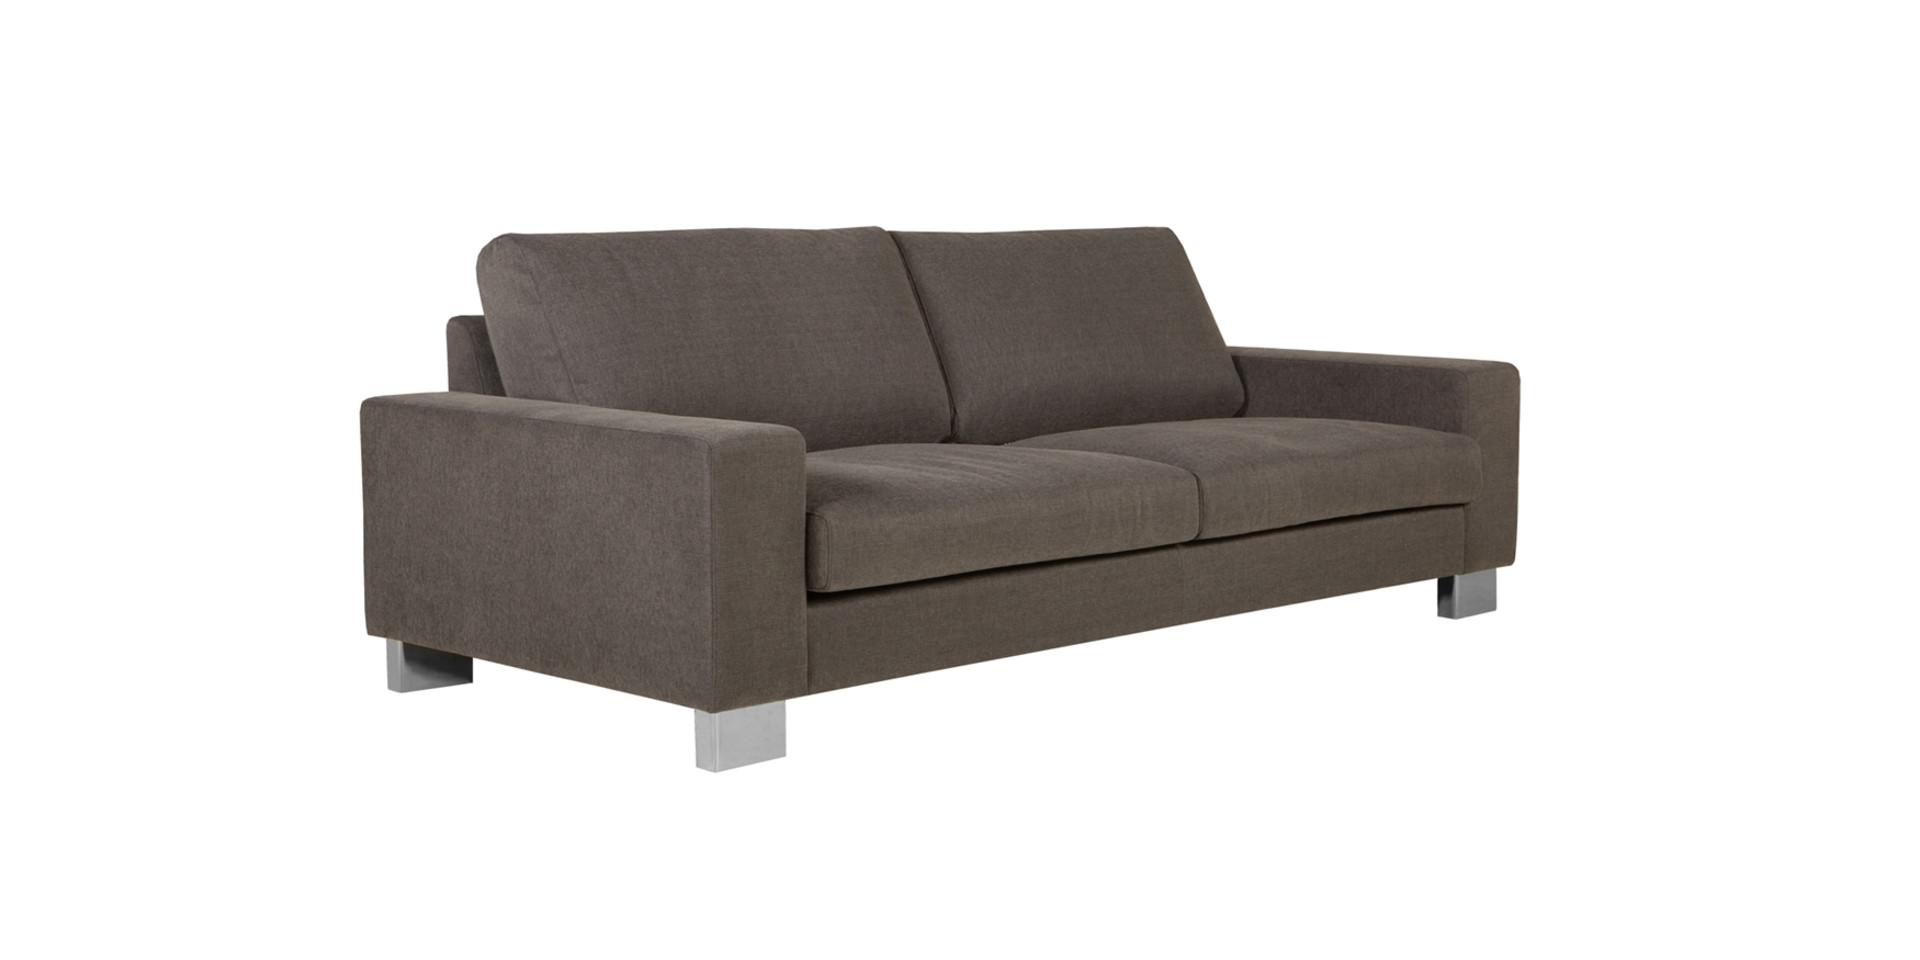 sits-quattro-canape-3seater90_drom54_grey_2